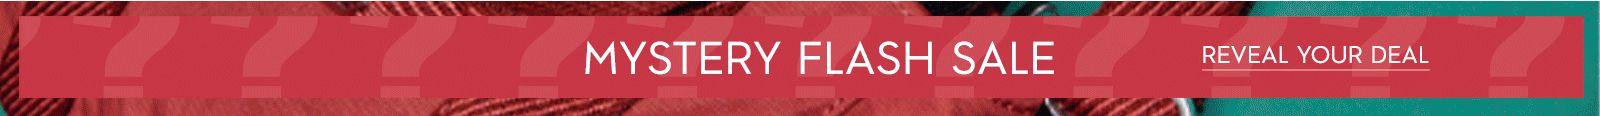 Mystery flash sale